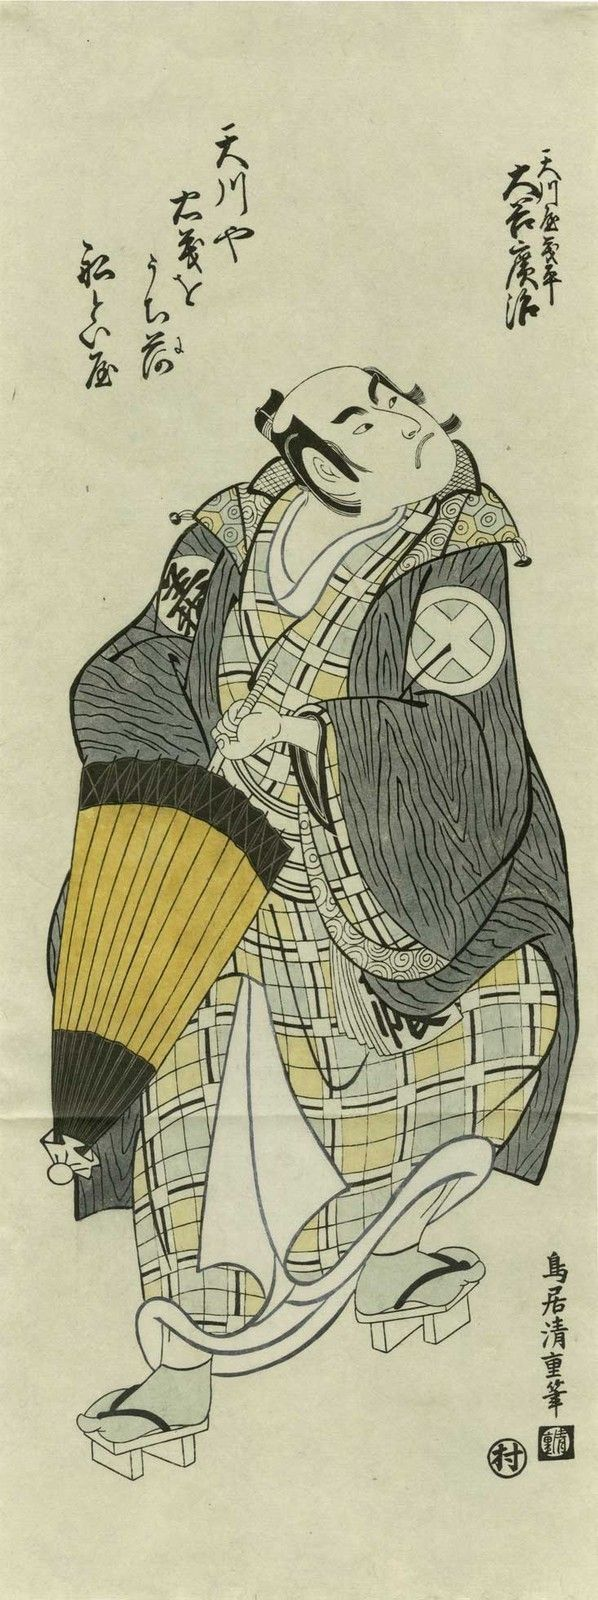 TORII KIYOSHIGE ACTOR PRINT 1740s